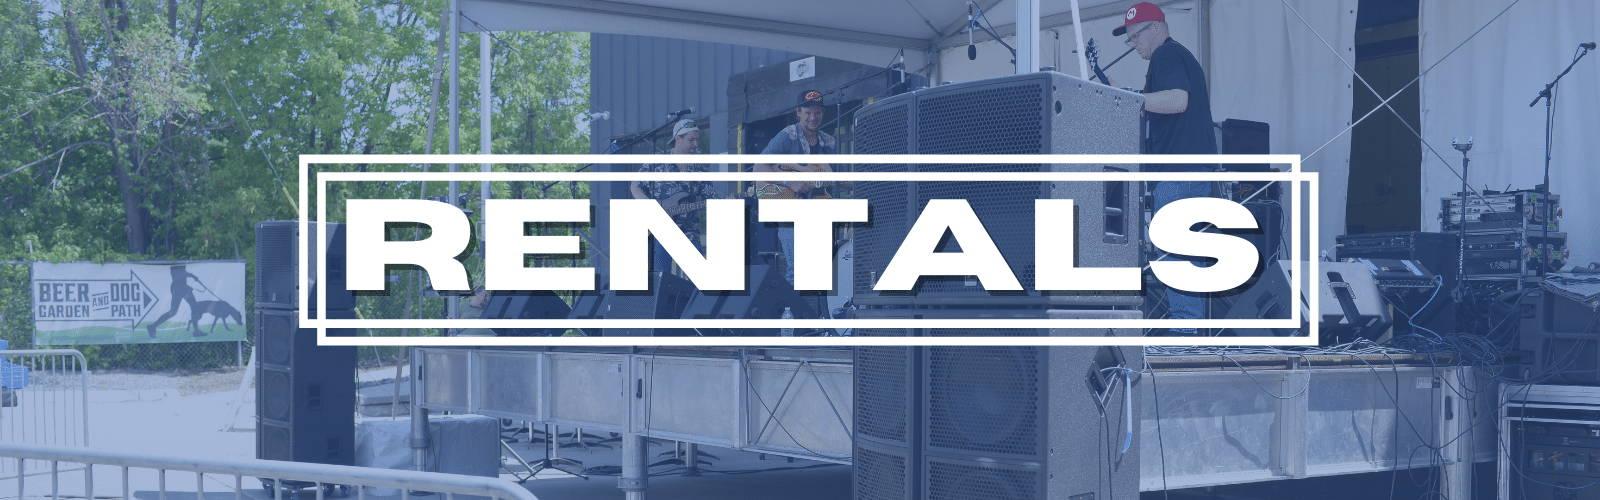 EMI Audio - Rentals of Audio / Video products